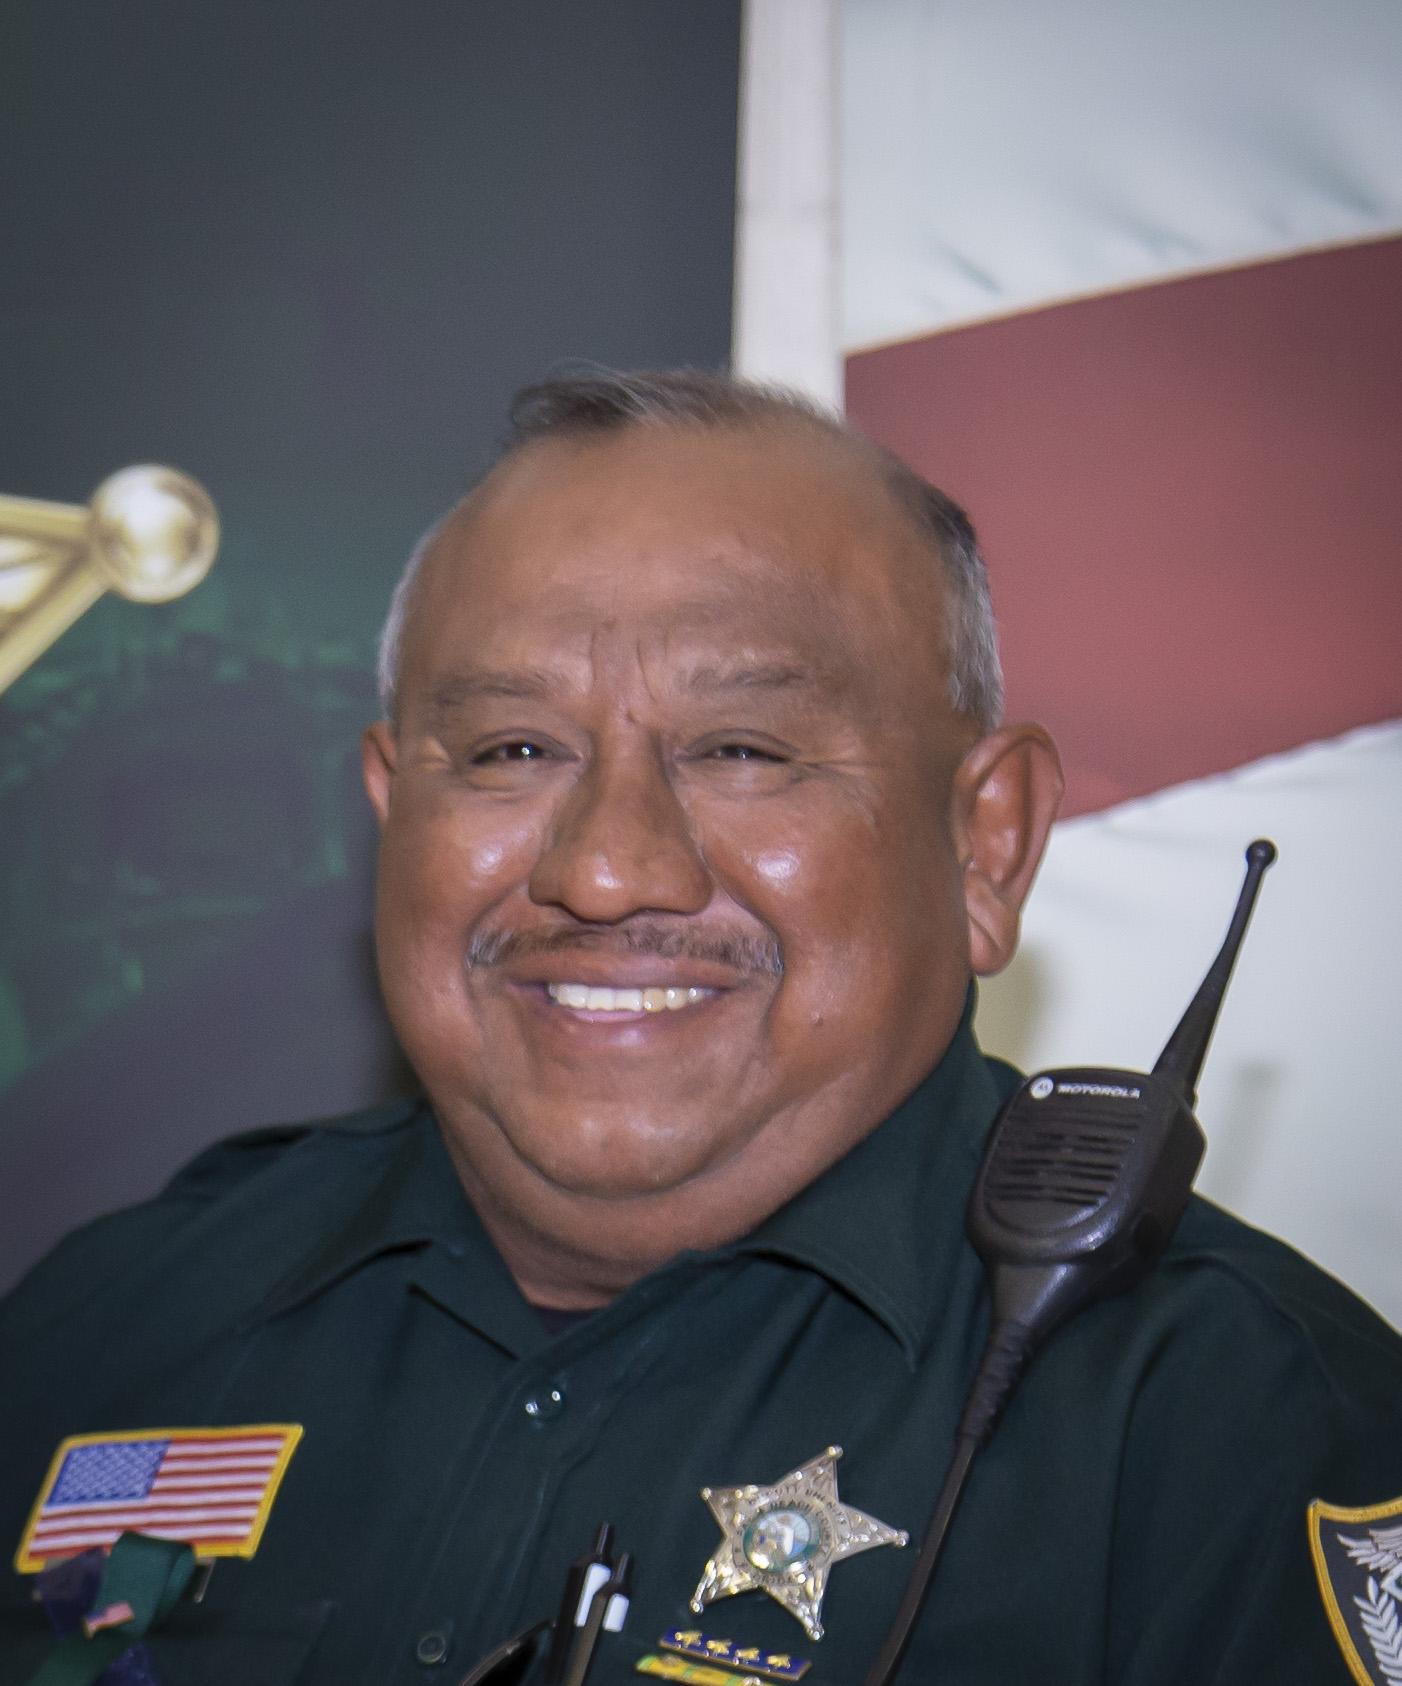 Deputy Sheriff Jacinto R. Navarro, Jr. | Palm Beach County Sheriff's Office, Florida